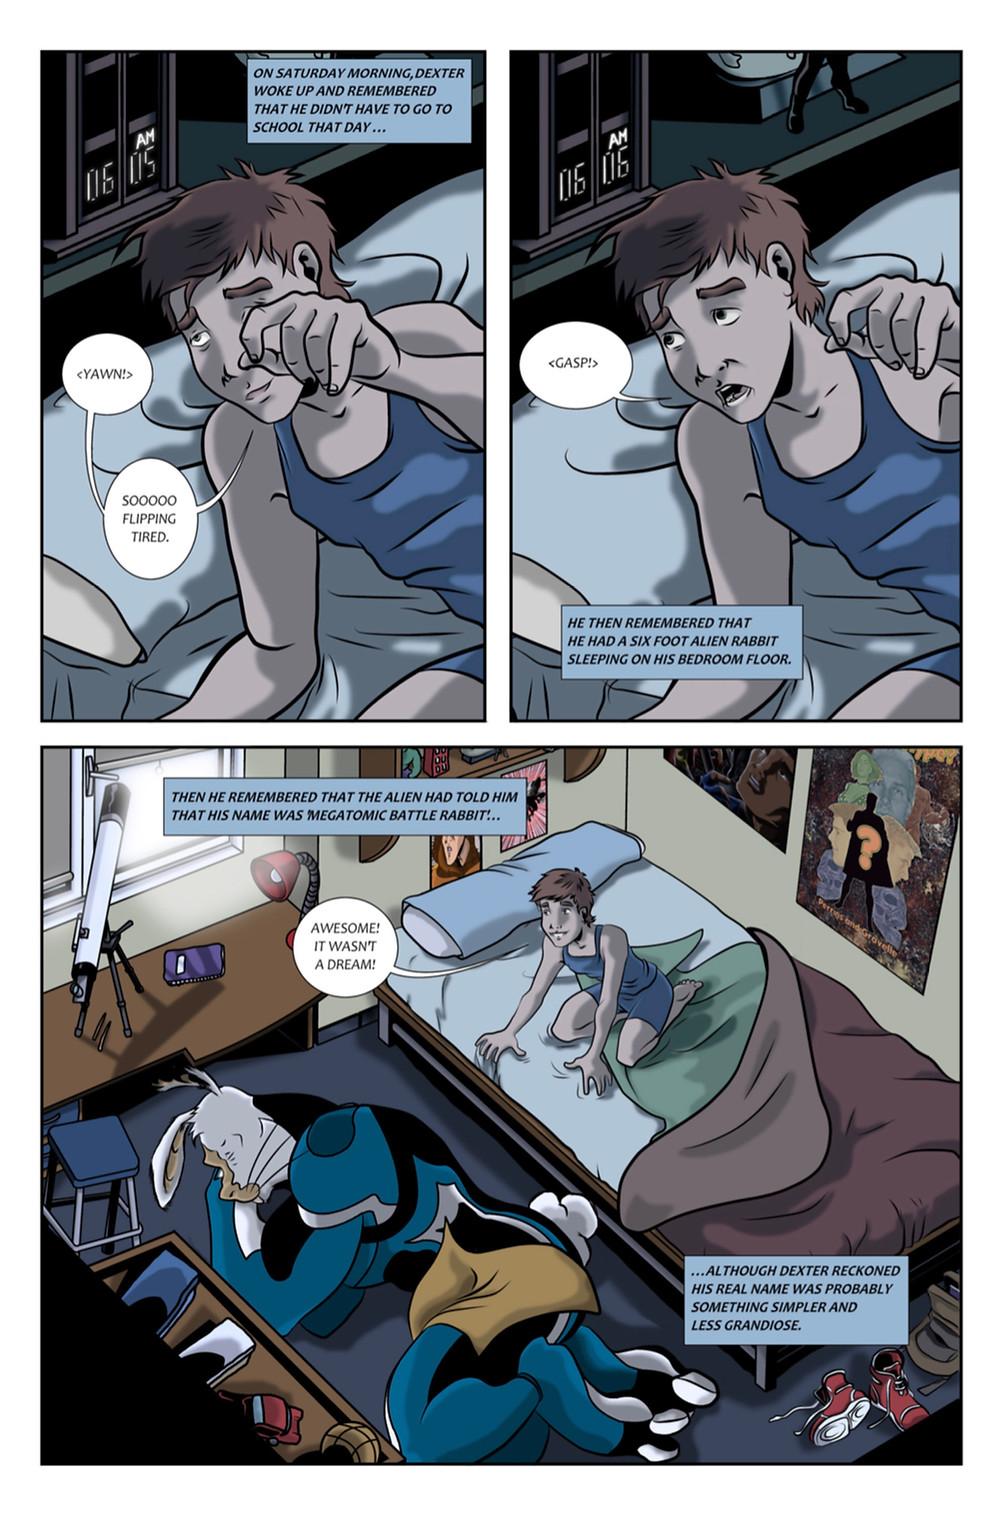 Megatomic Battle Rabbit, issue #2, page 2, Fair Spark Books, Perrins/Huertas